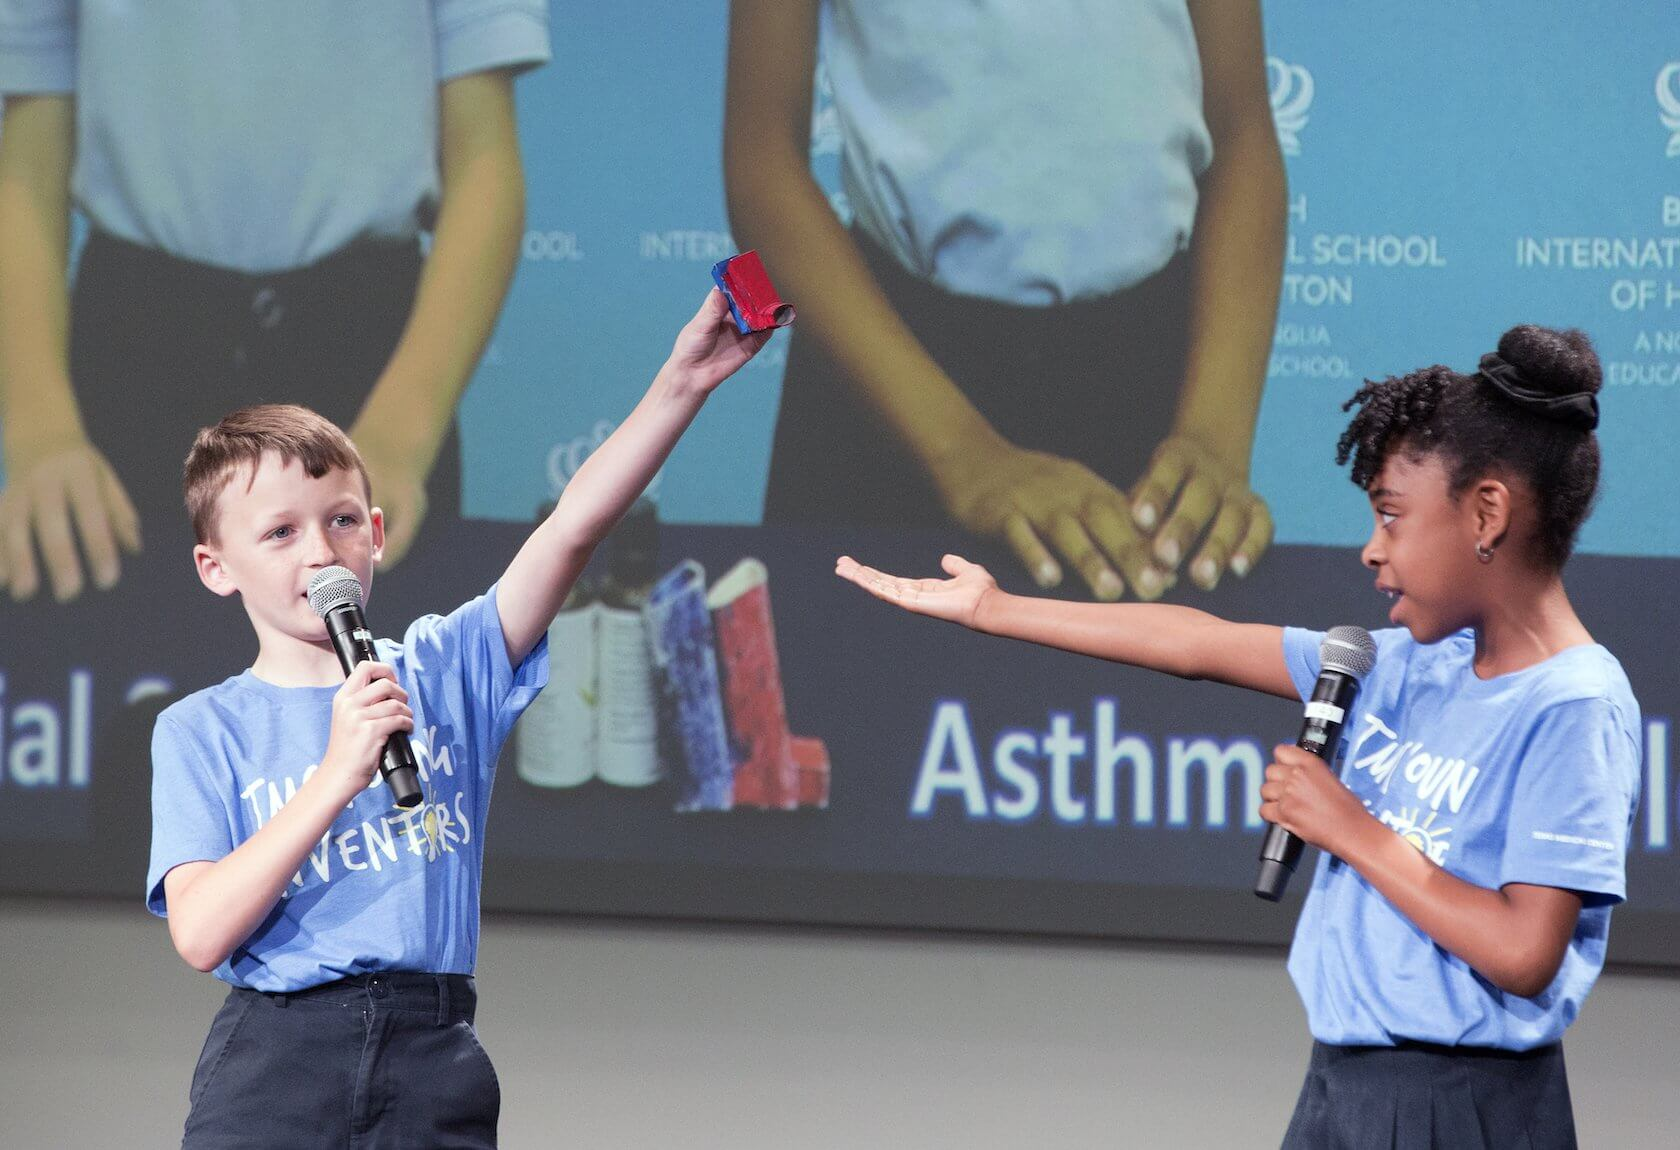 TMC Young Inventors, British International School of Houston